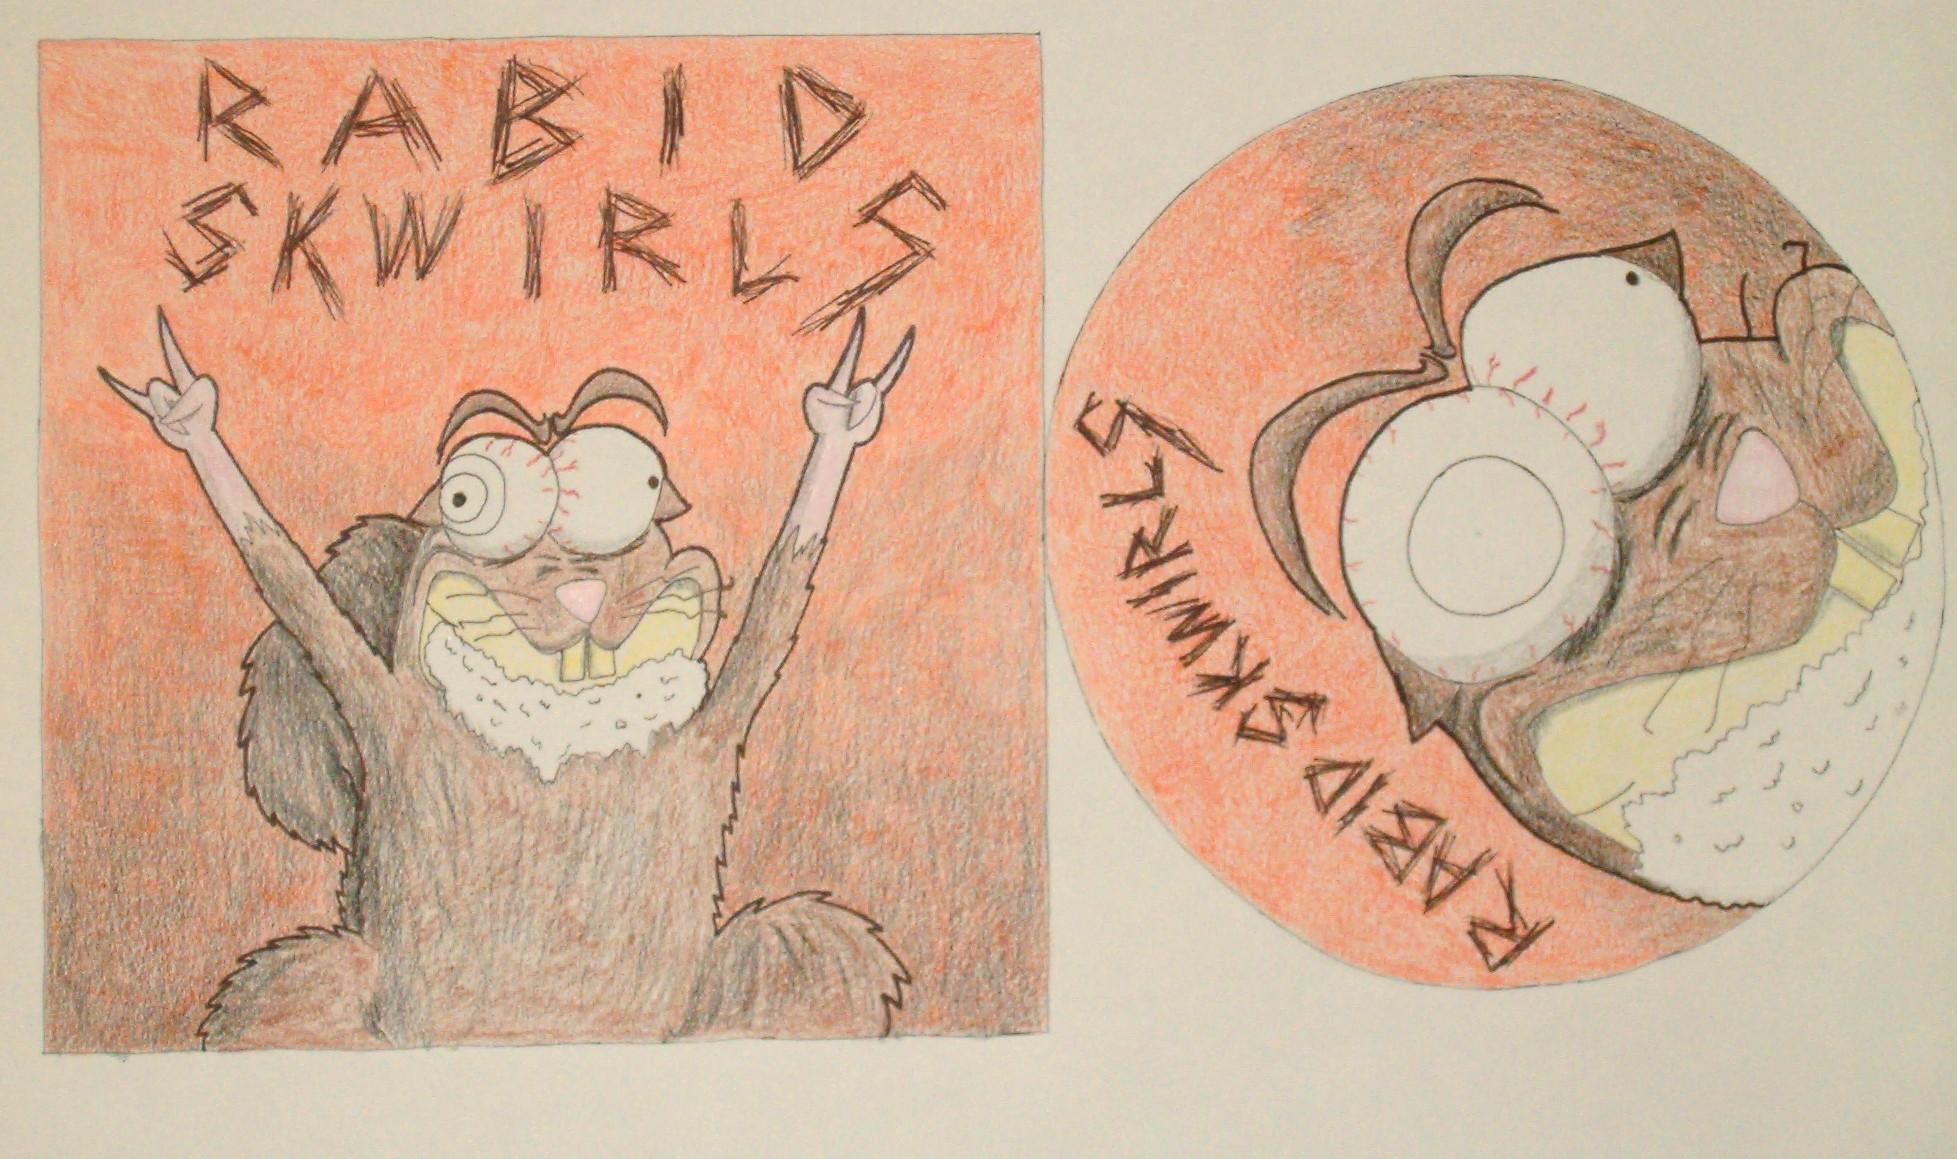 Rabid Skwirls